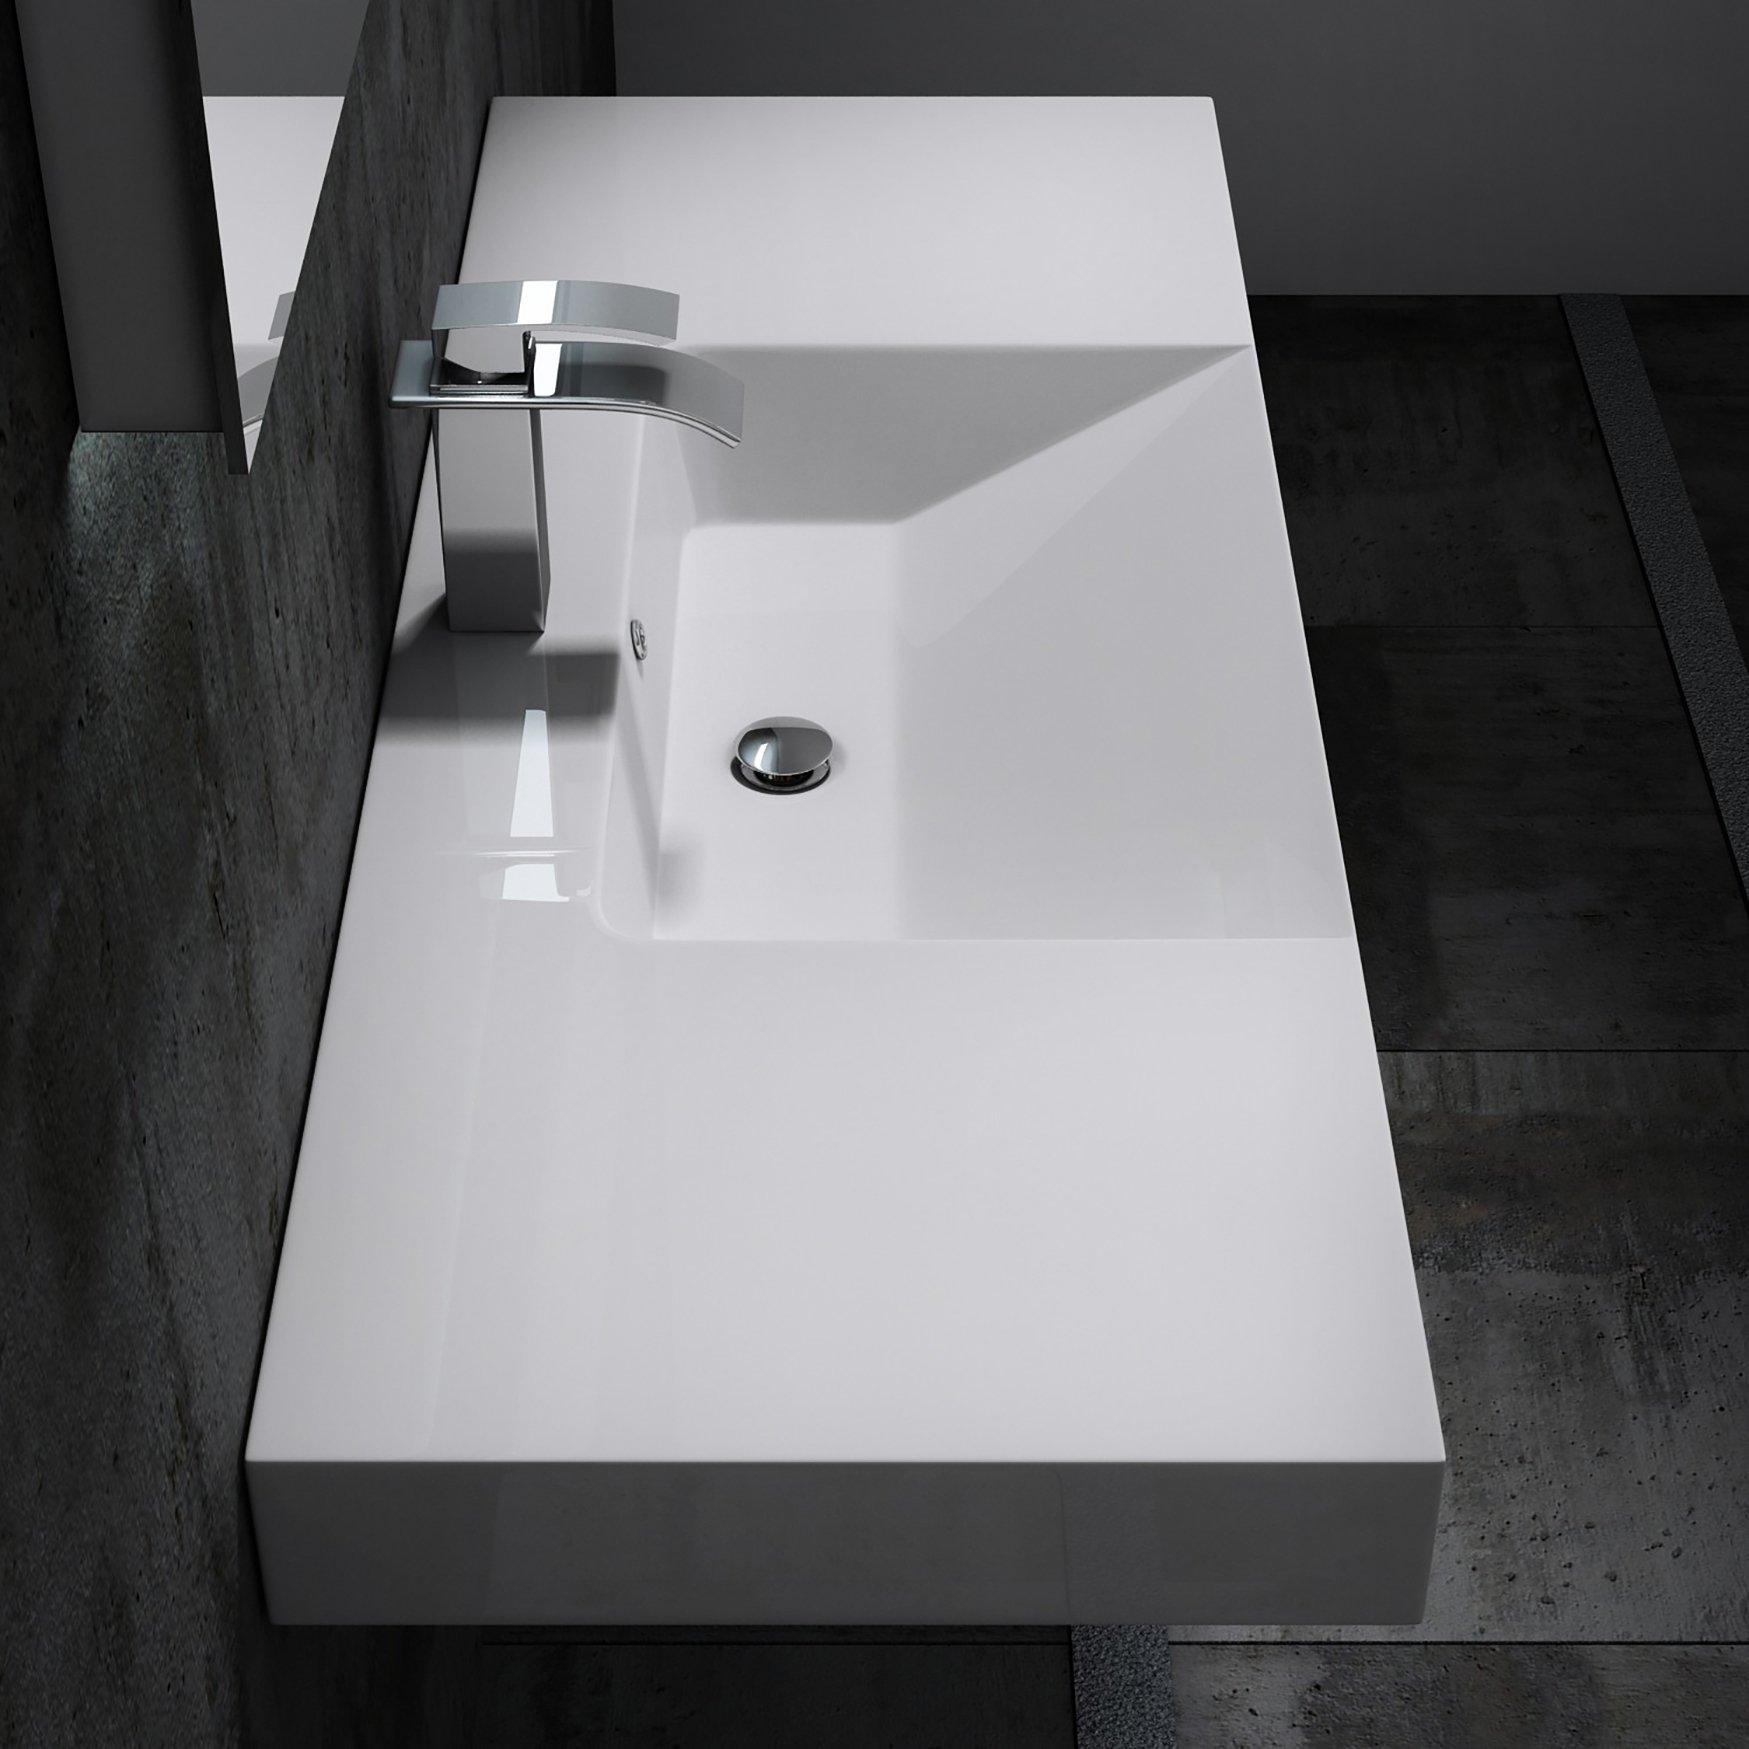 Wandwaschbecken BS6036 in Weiß - 122 x 48 x 13,5 cm  zoom thumbnail 4